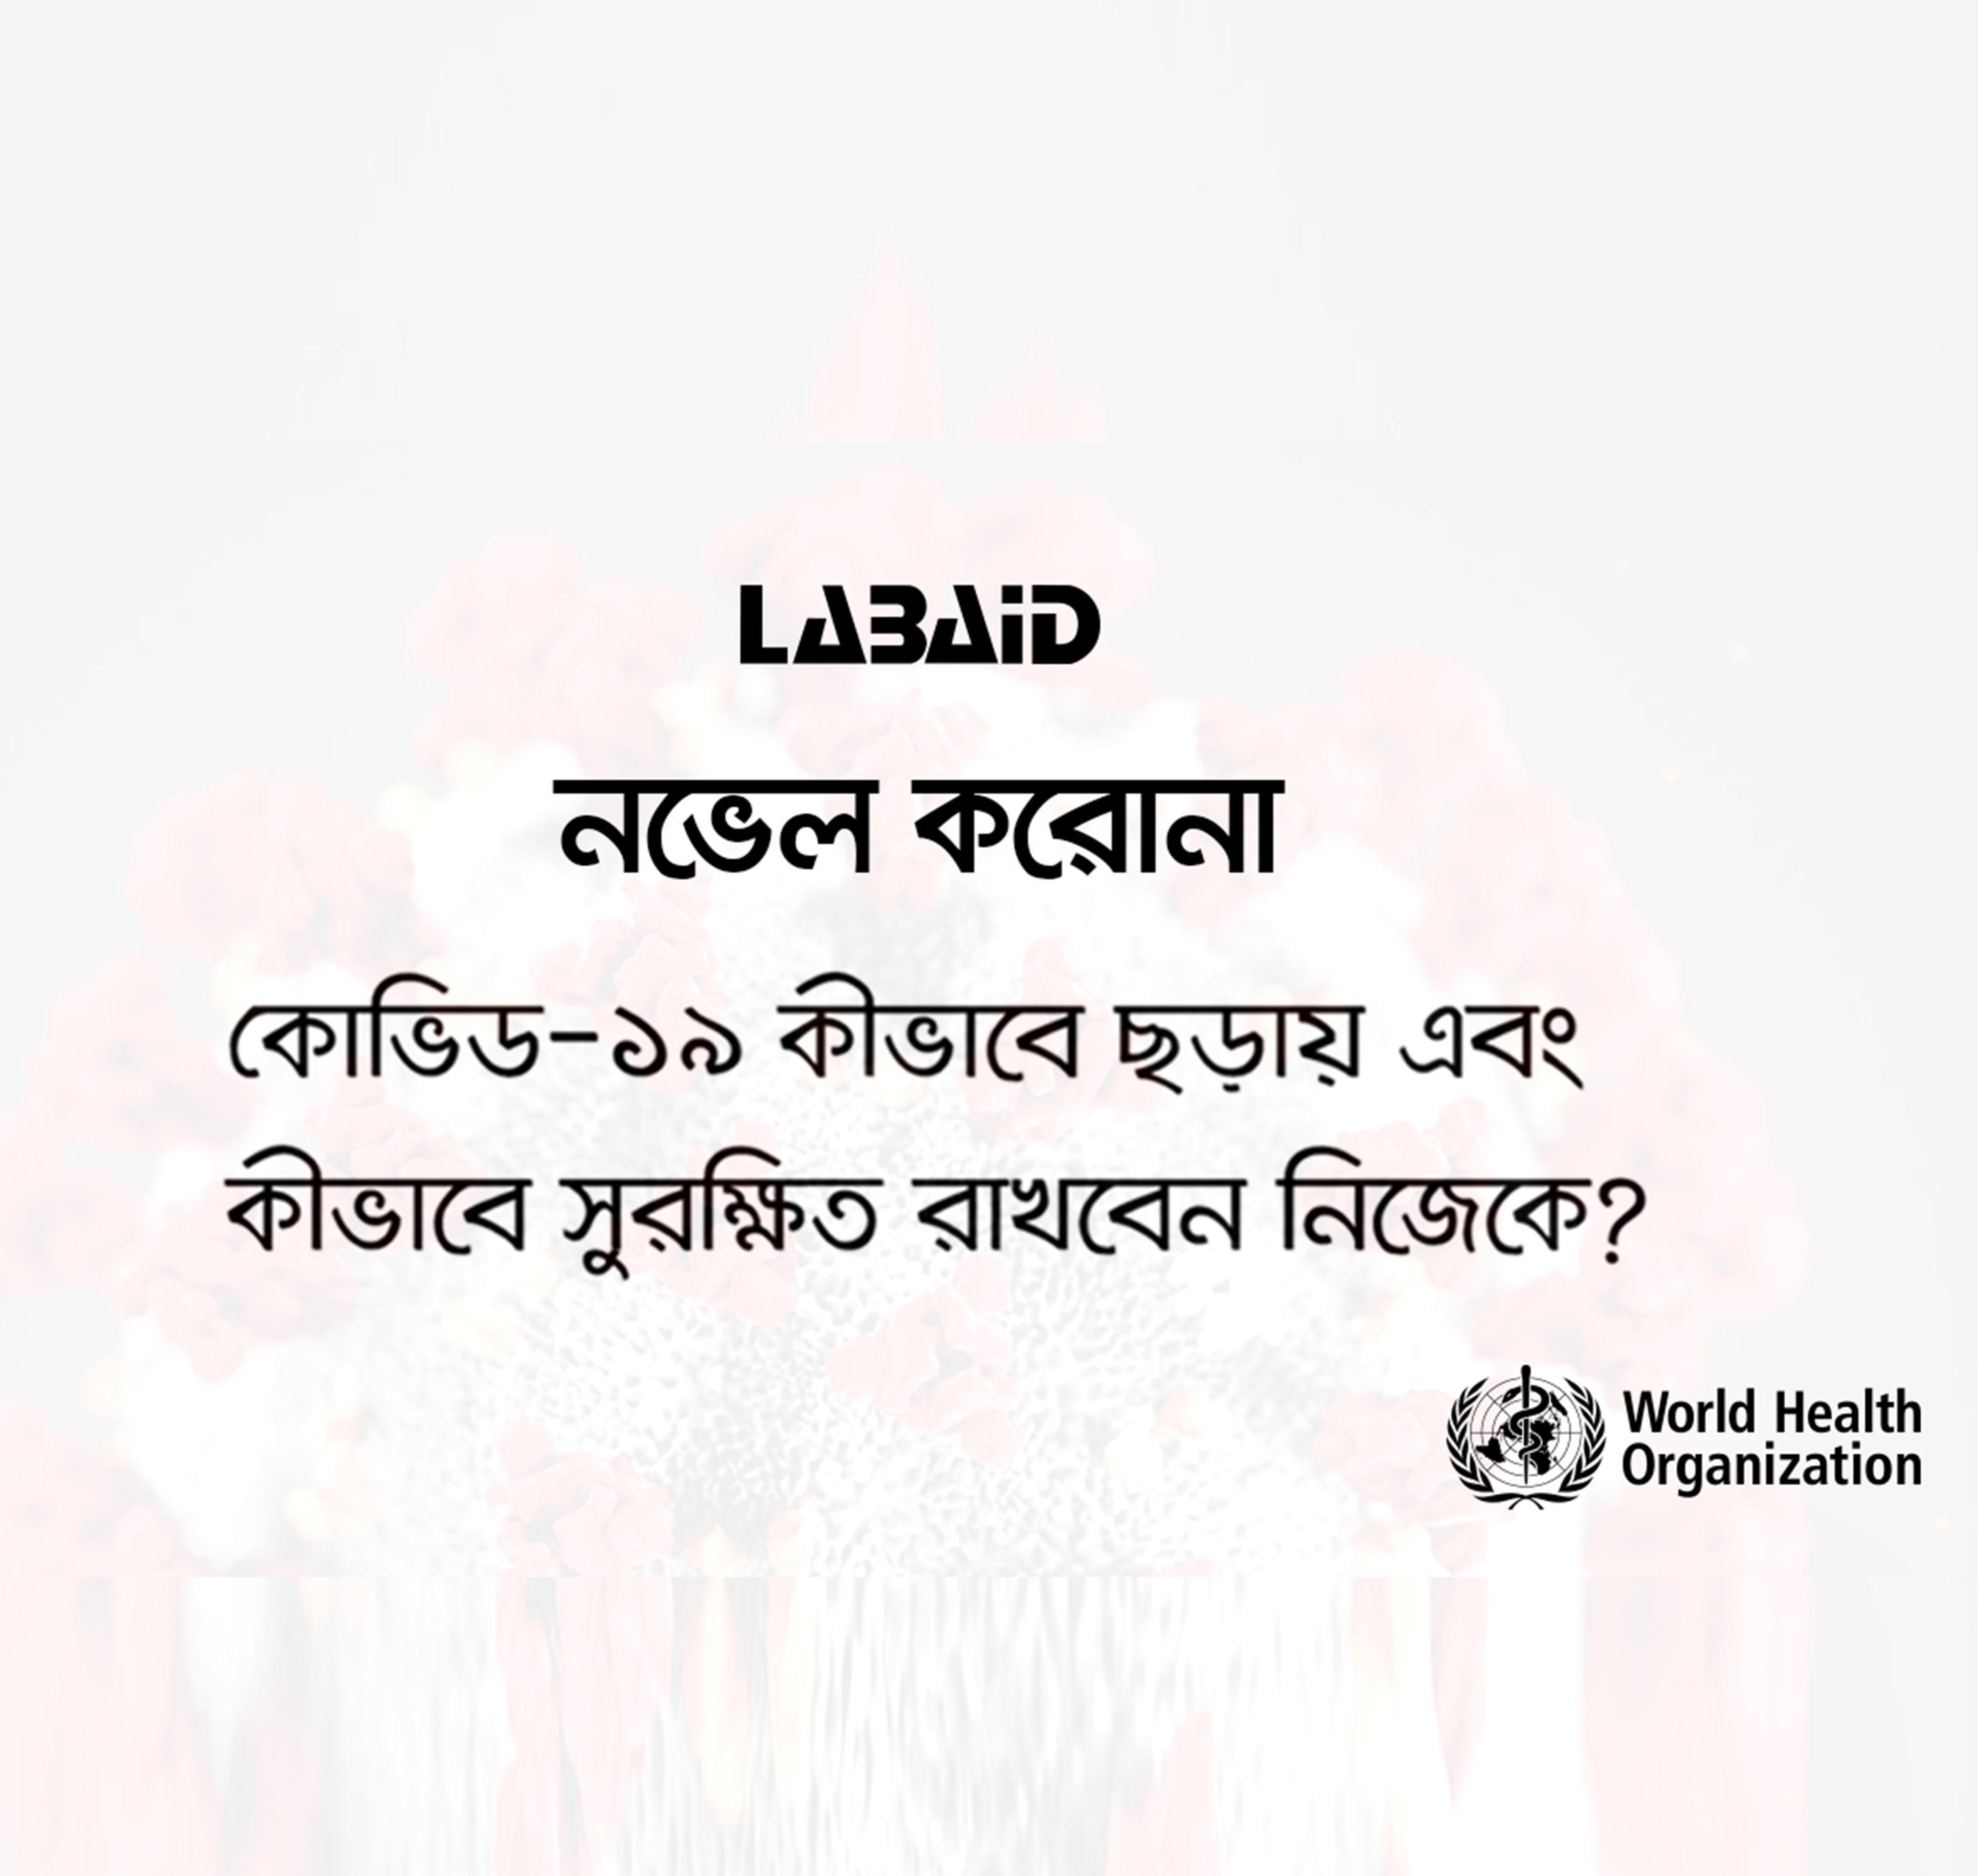 Protect Yourself Against CORONAVIRUS - LABAID